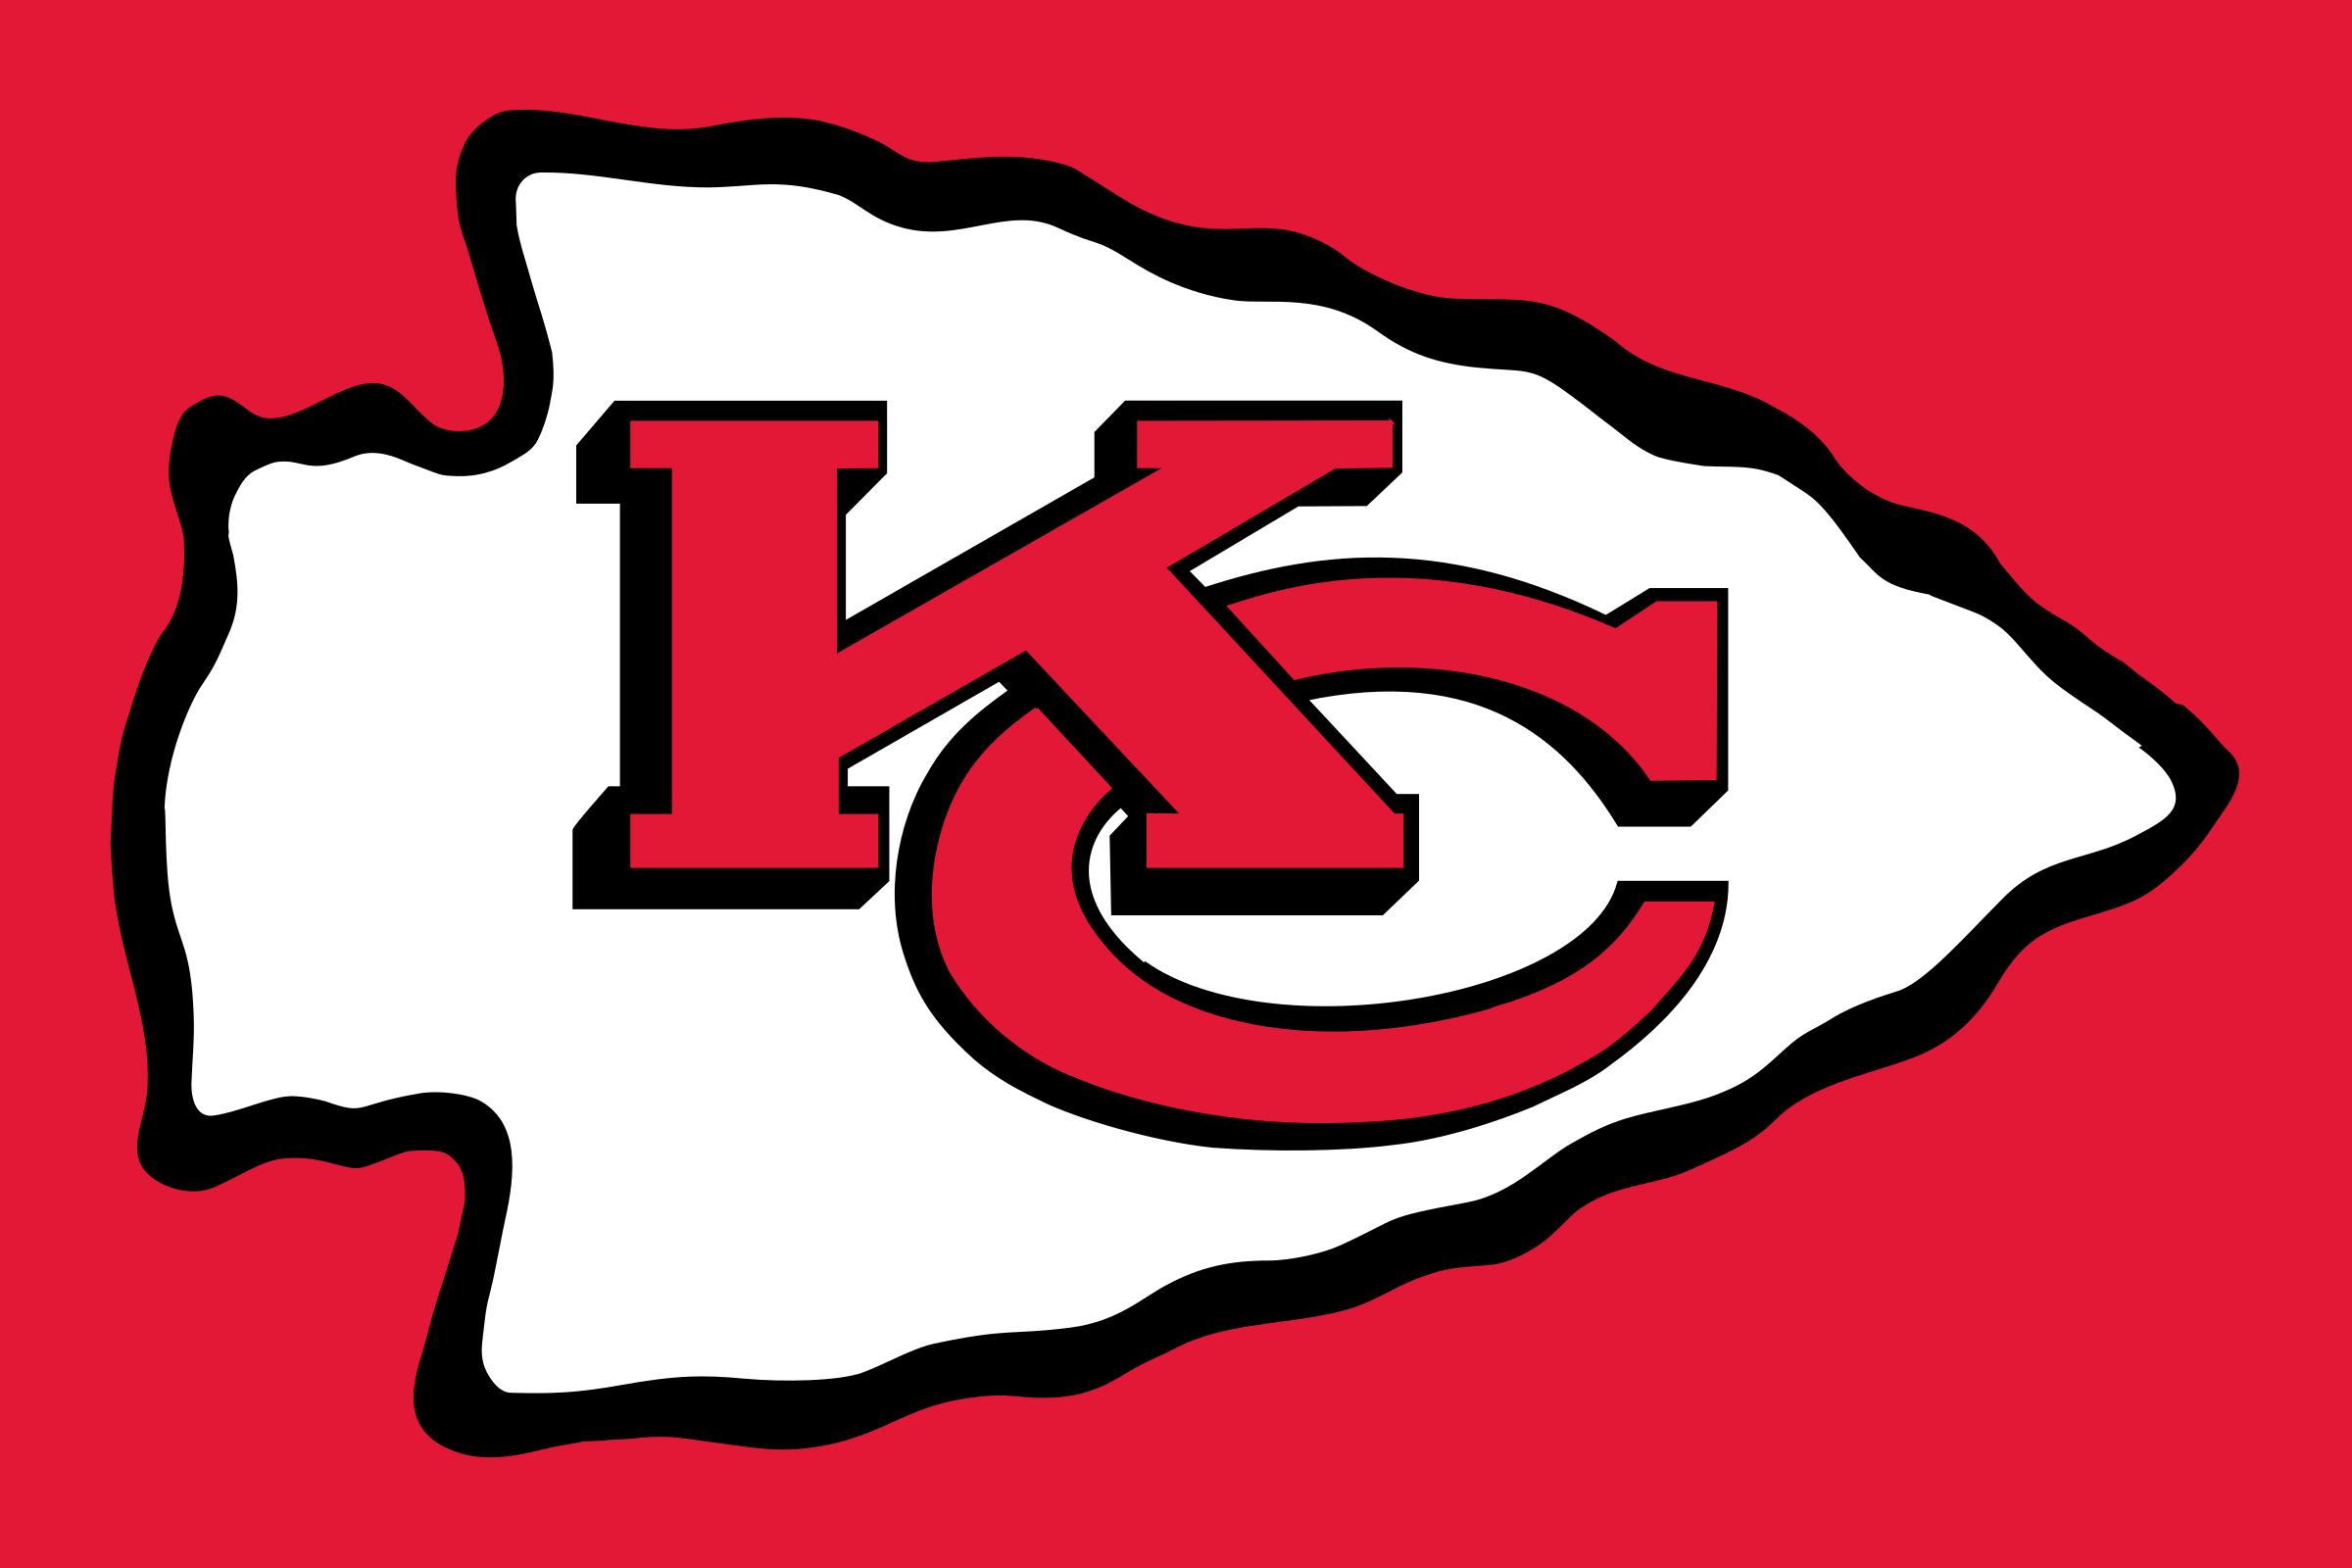 Kansas City Chiefs Arrowhead Logo - Kansas City Chiefs, Transparent background PNG HD thumbnail